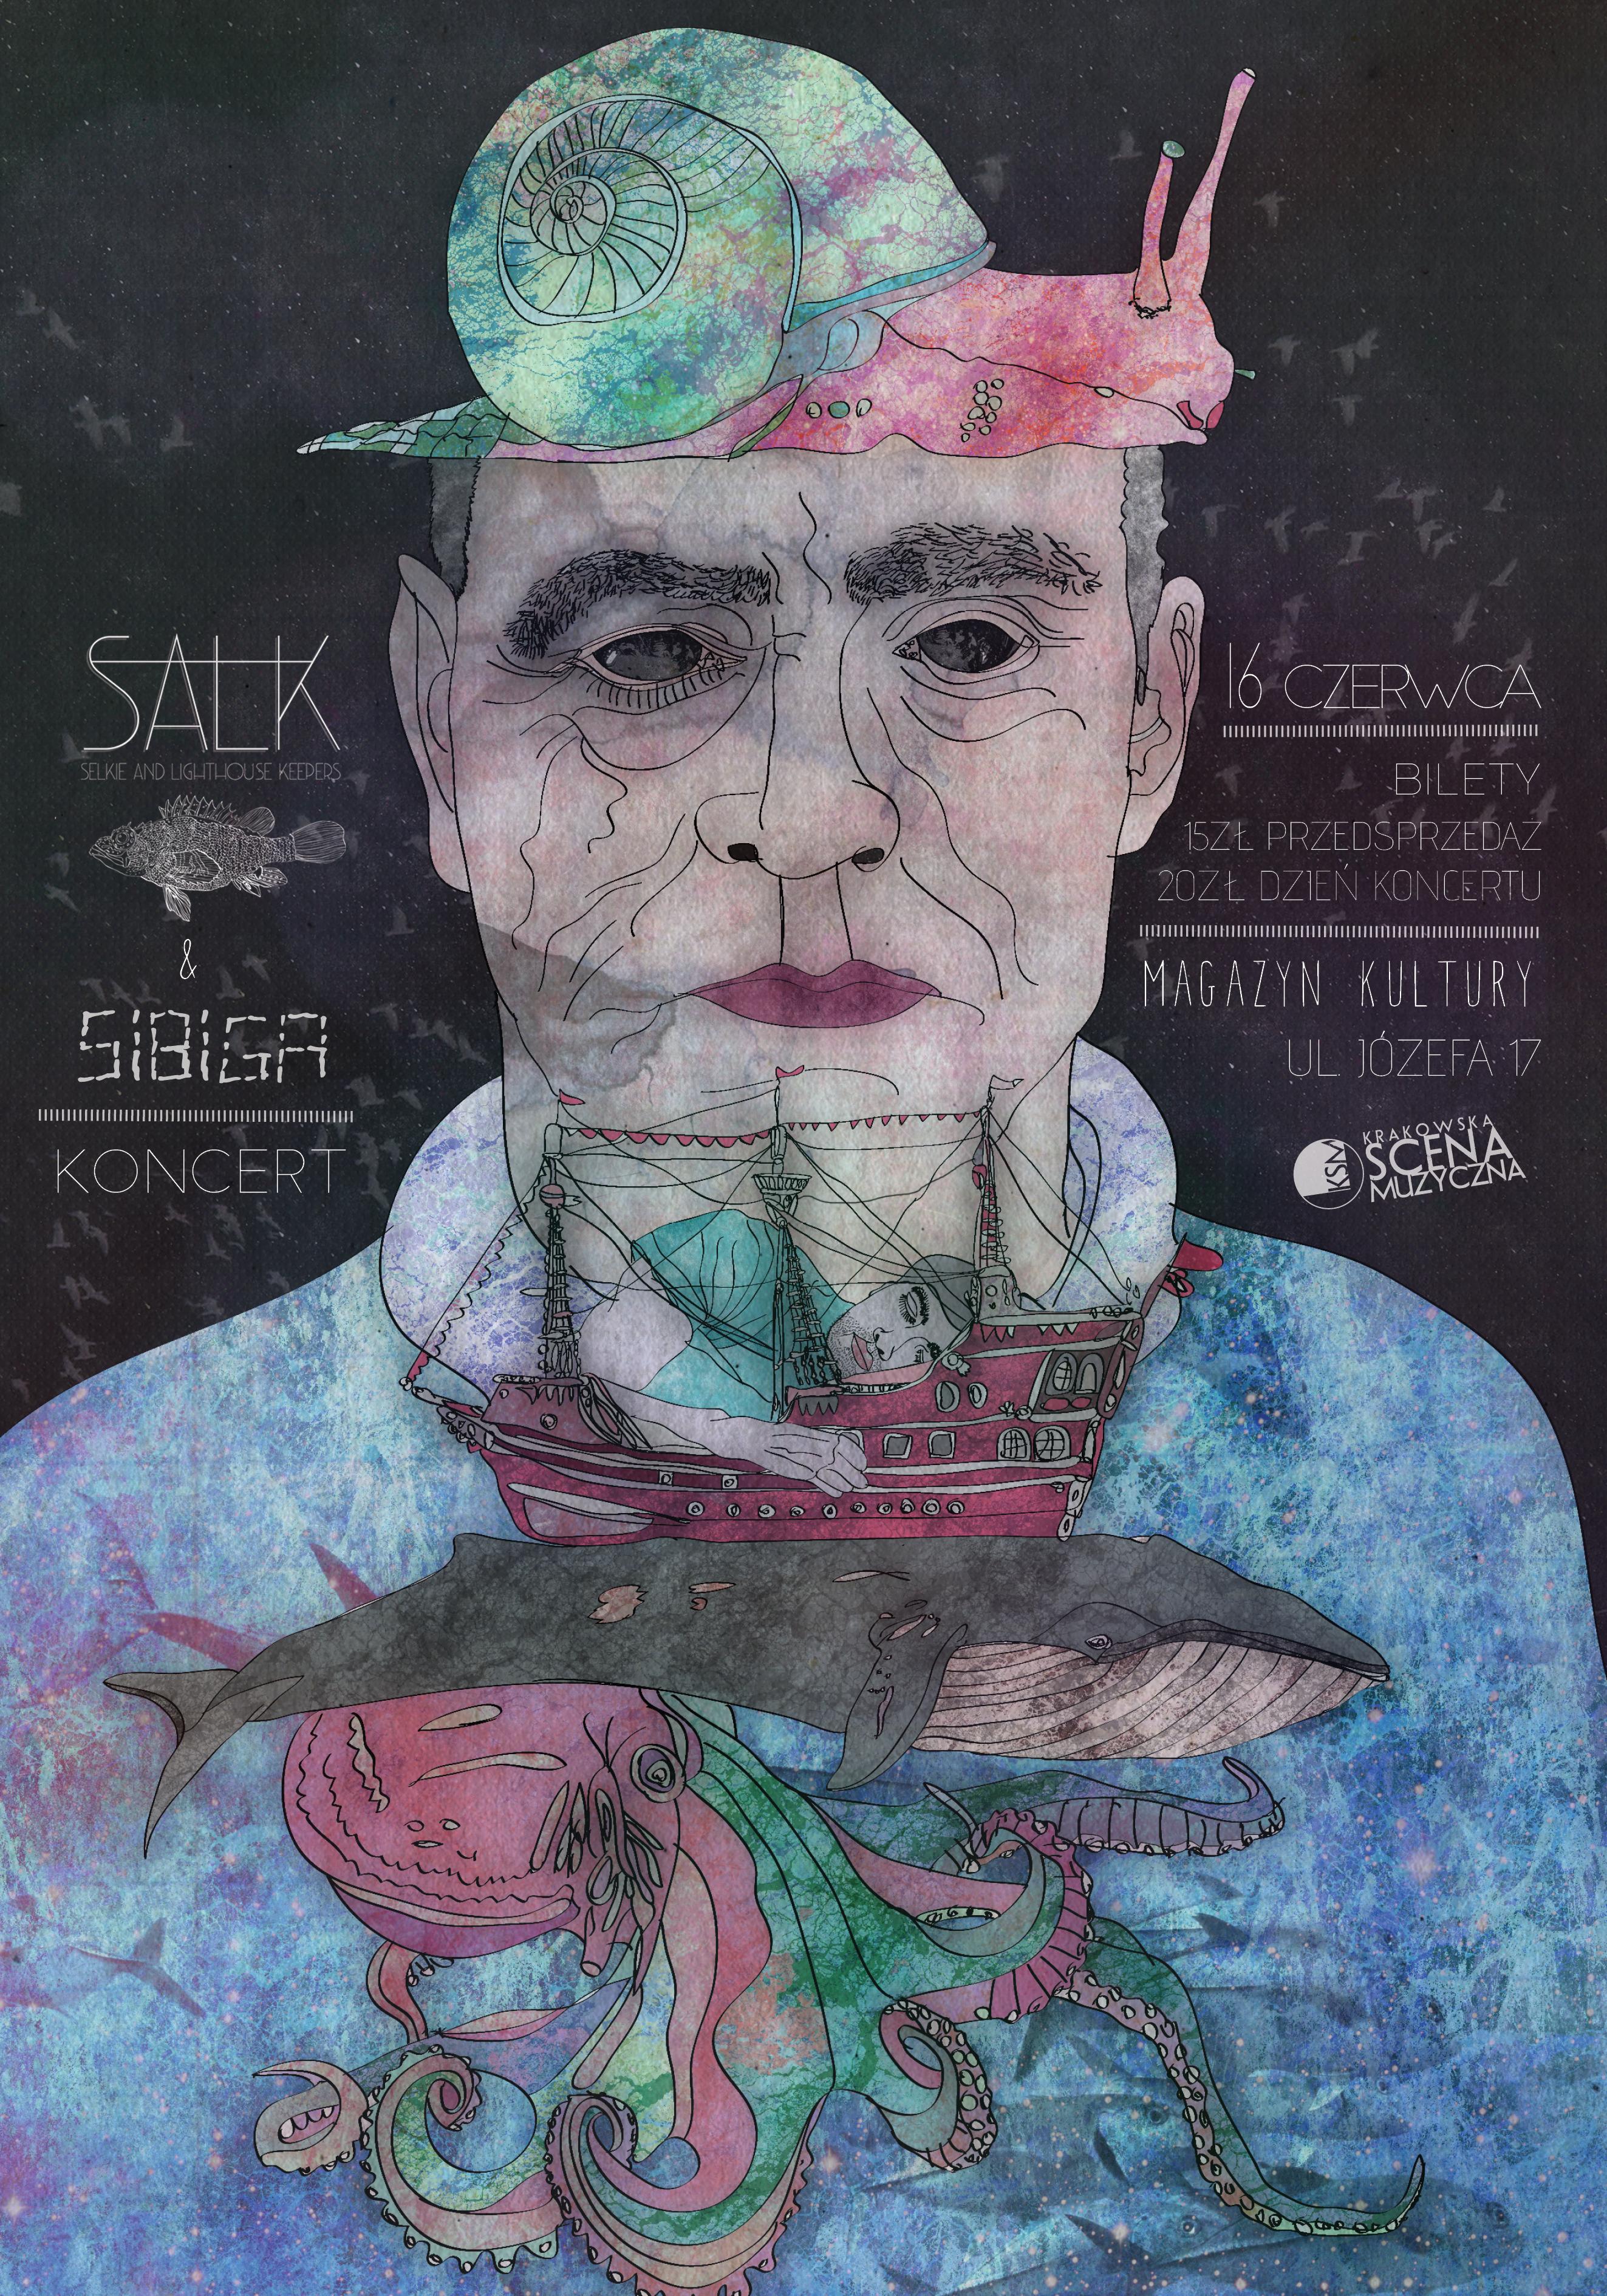 Plakat Salk concert.